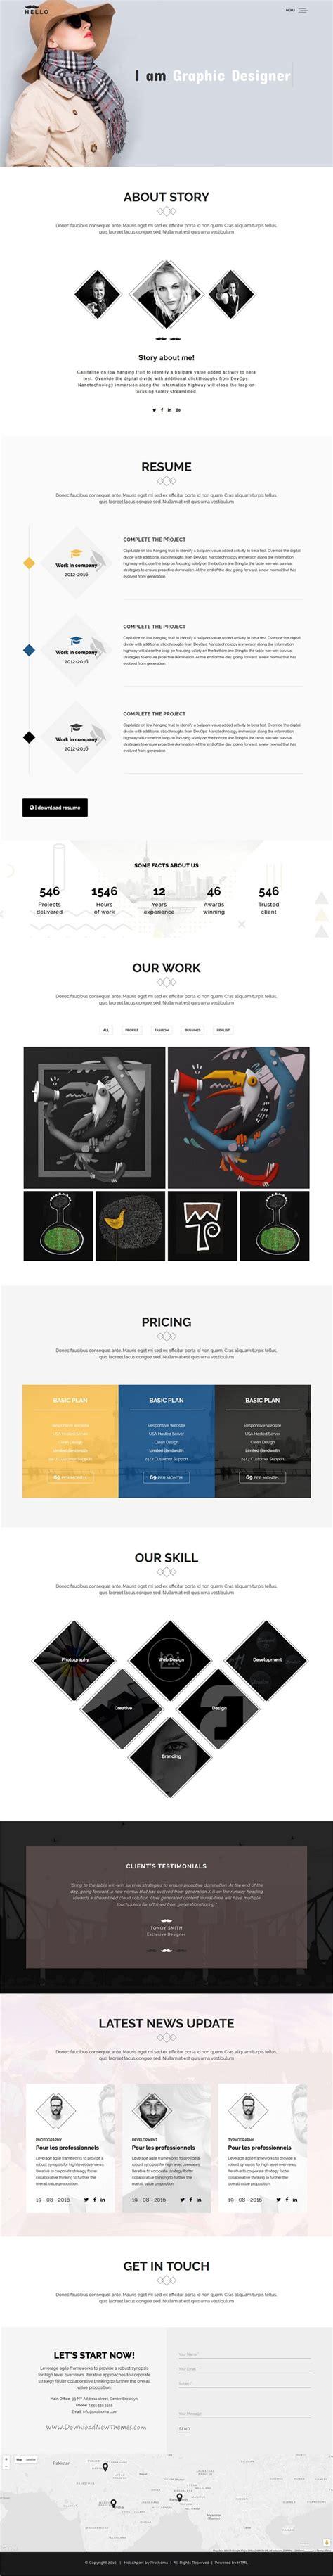 prothoma minimal design 5in1 responsive html5 bootstrap theme